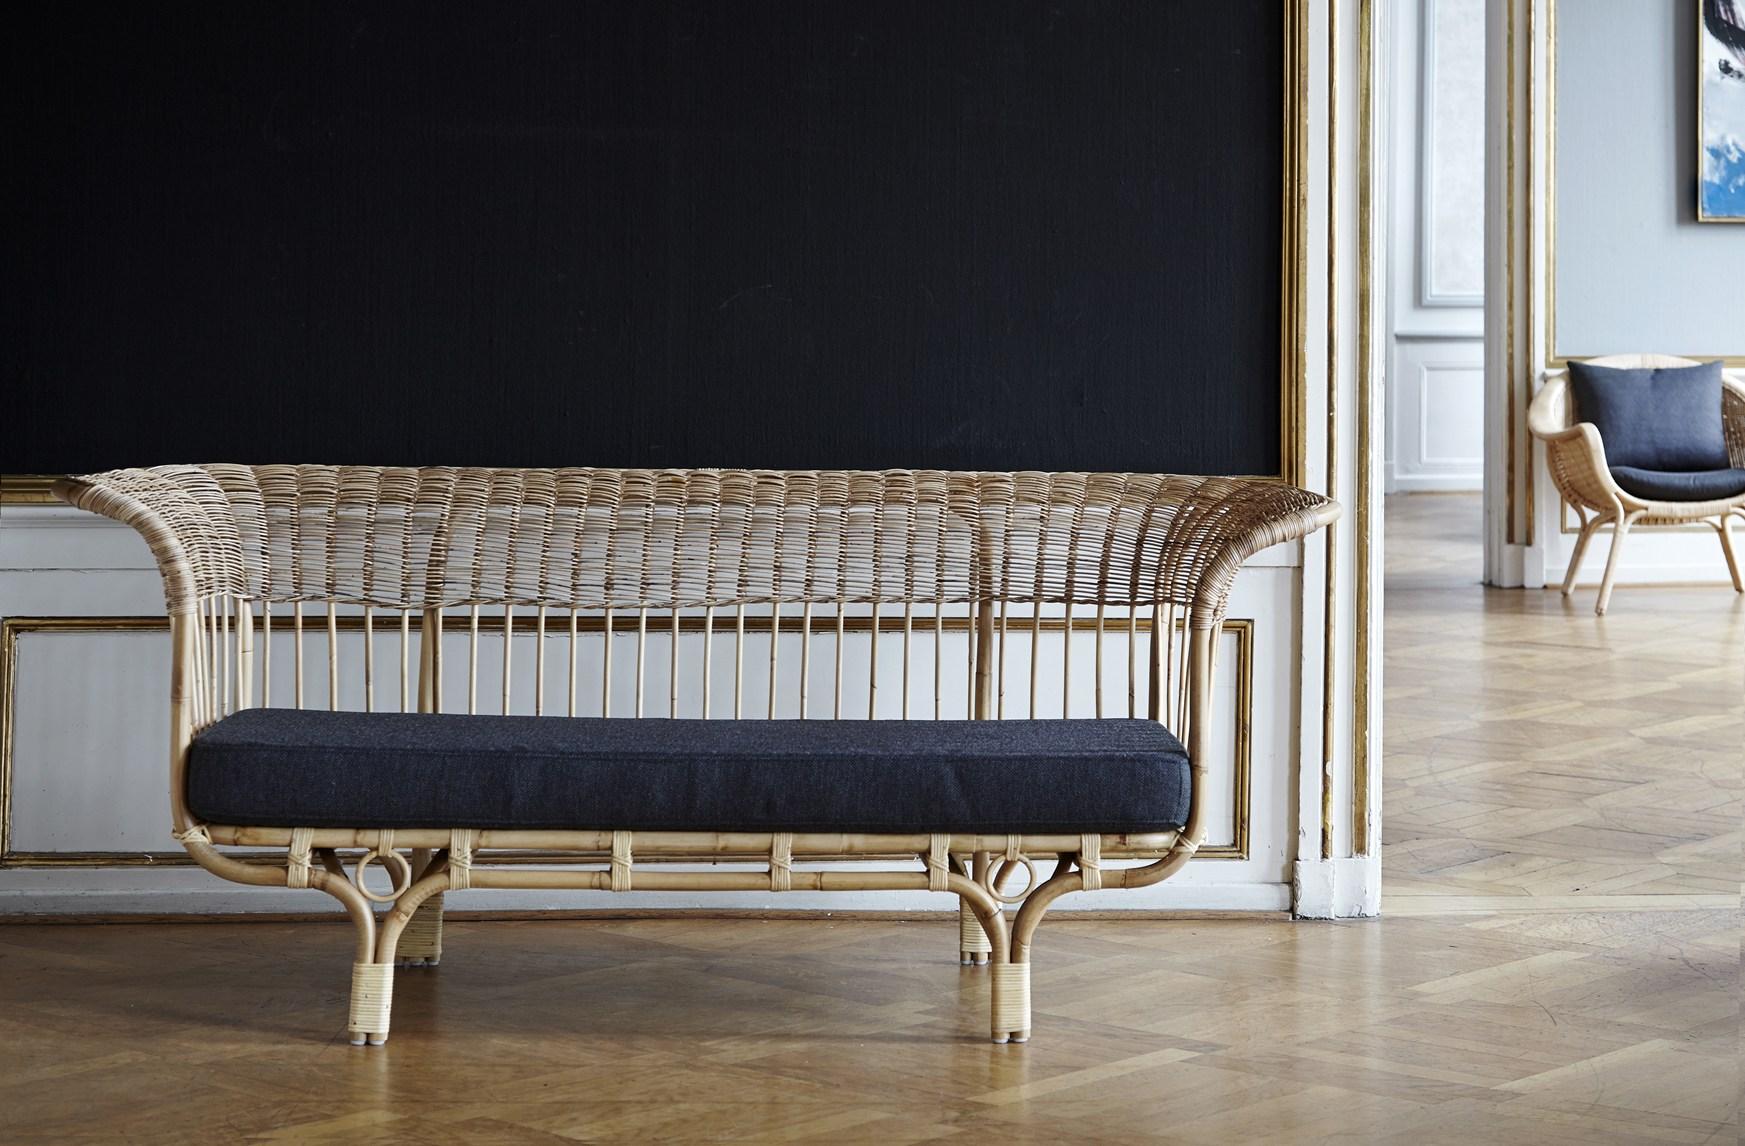 Franco Albini's 1951 'Belladonna' sofa - reissued by Sika Design.